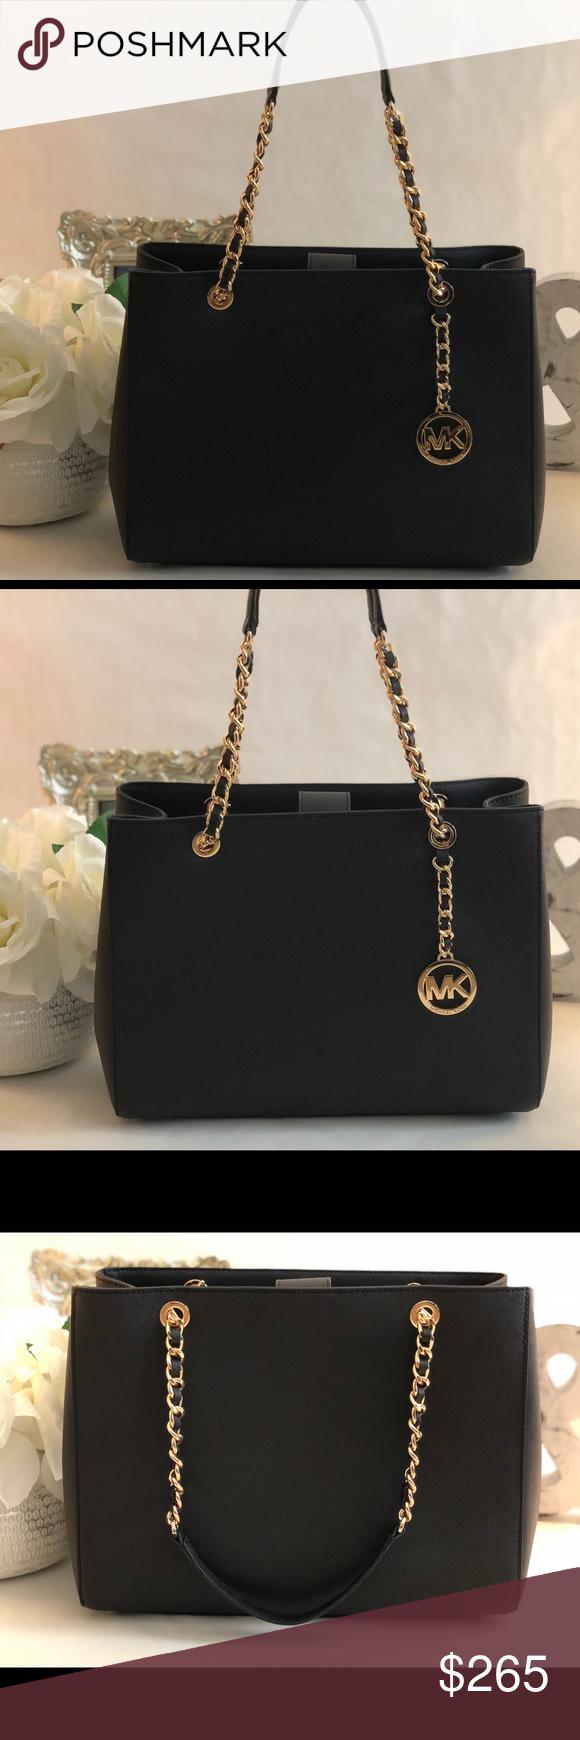 Michael Kors Susannah Black Gold Tote This bag very